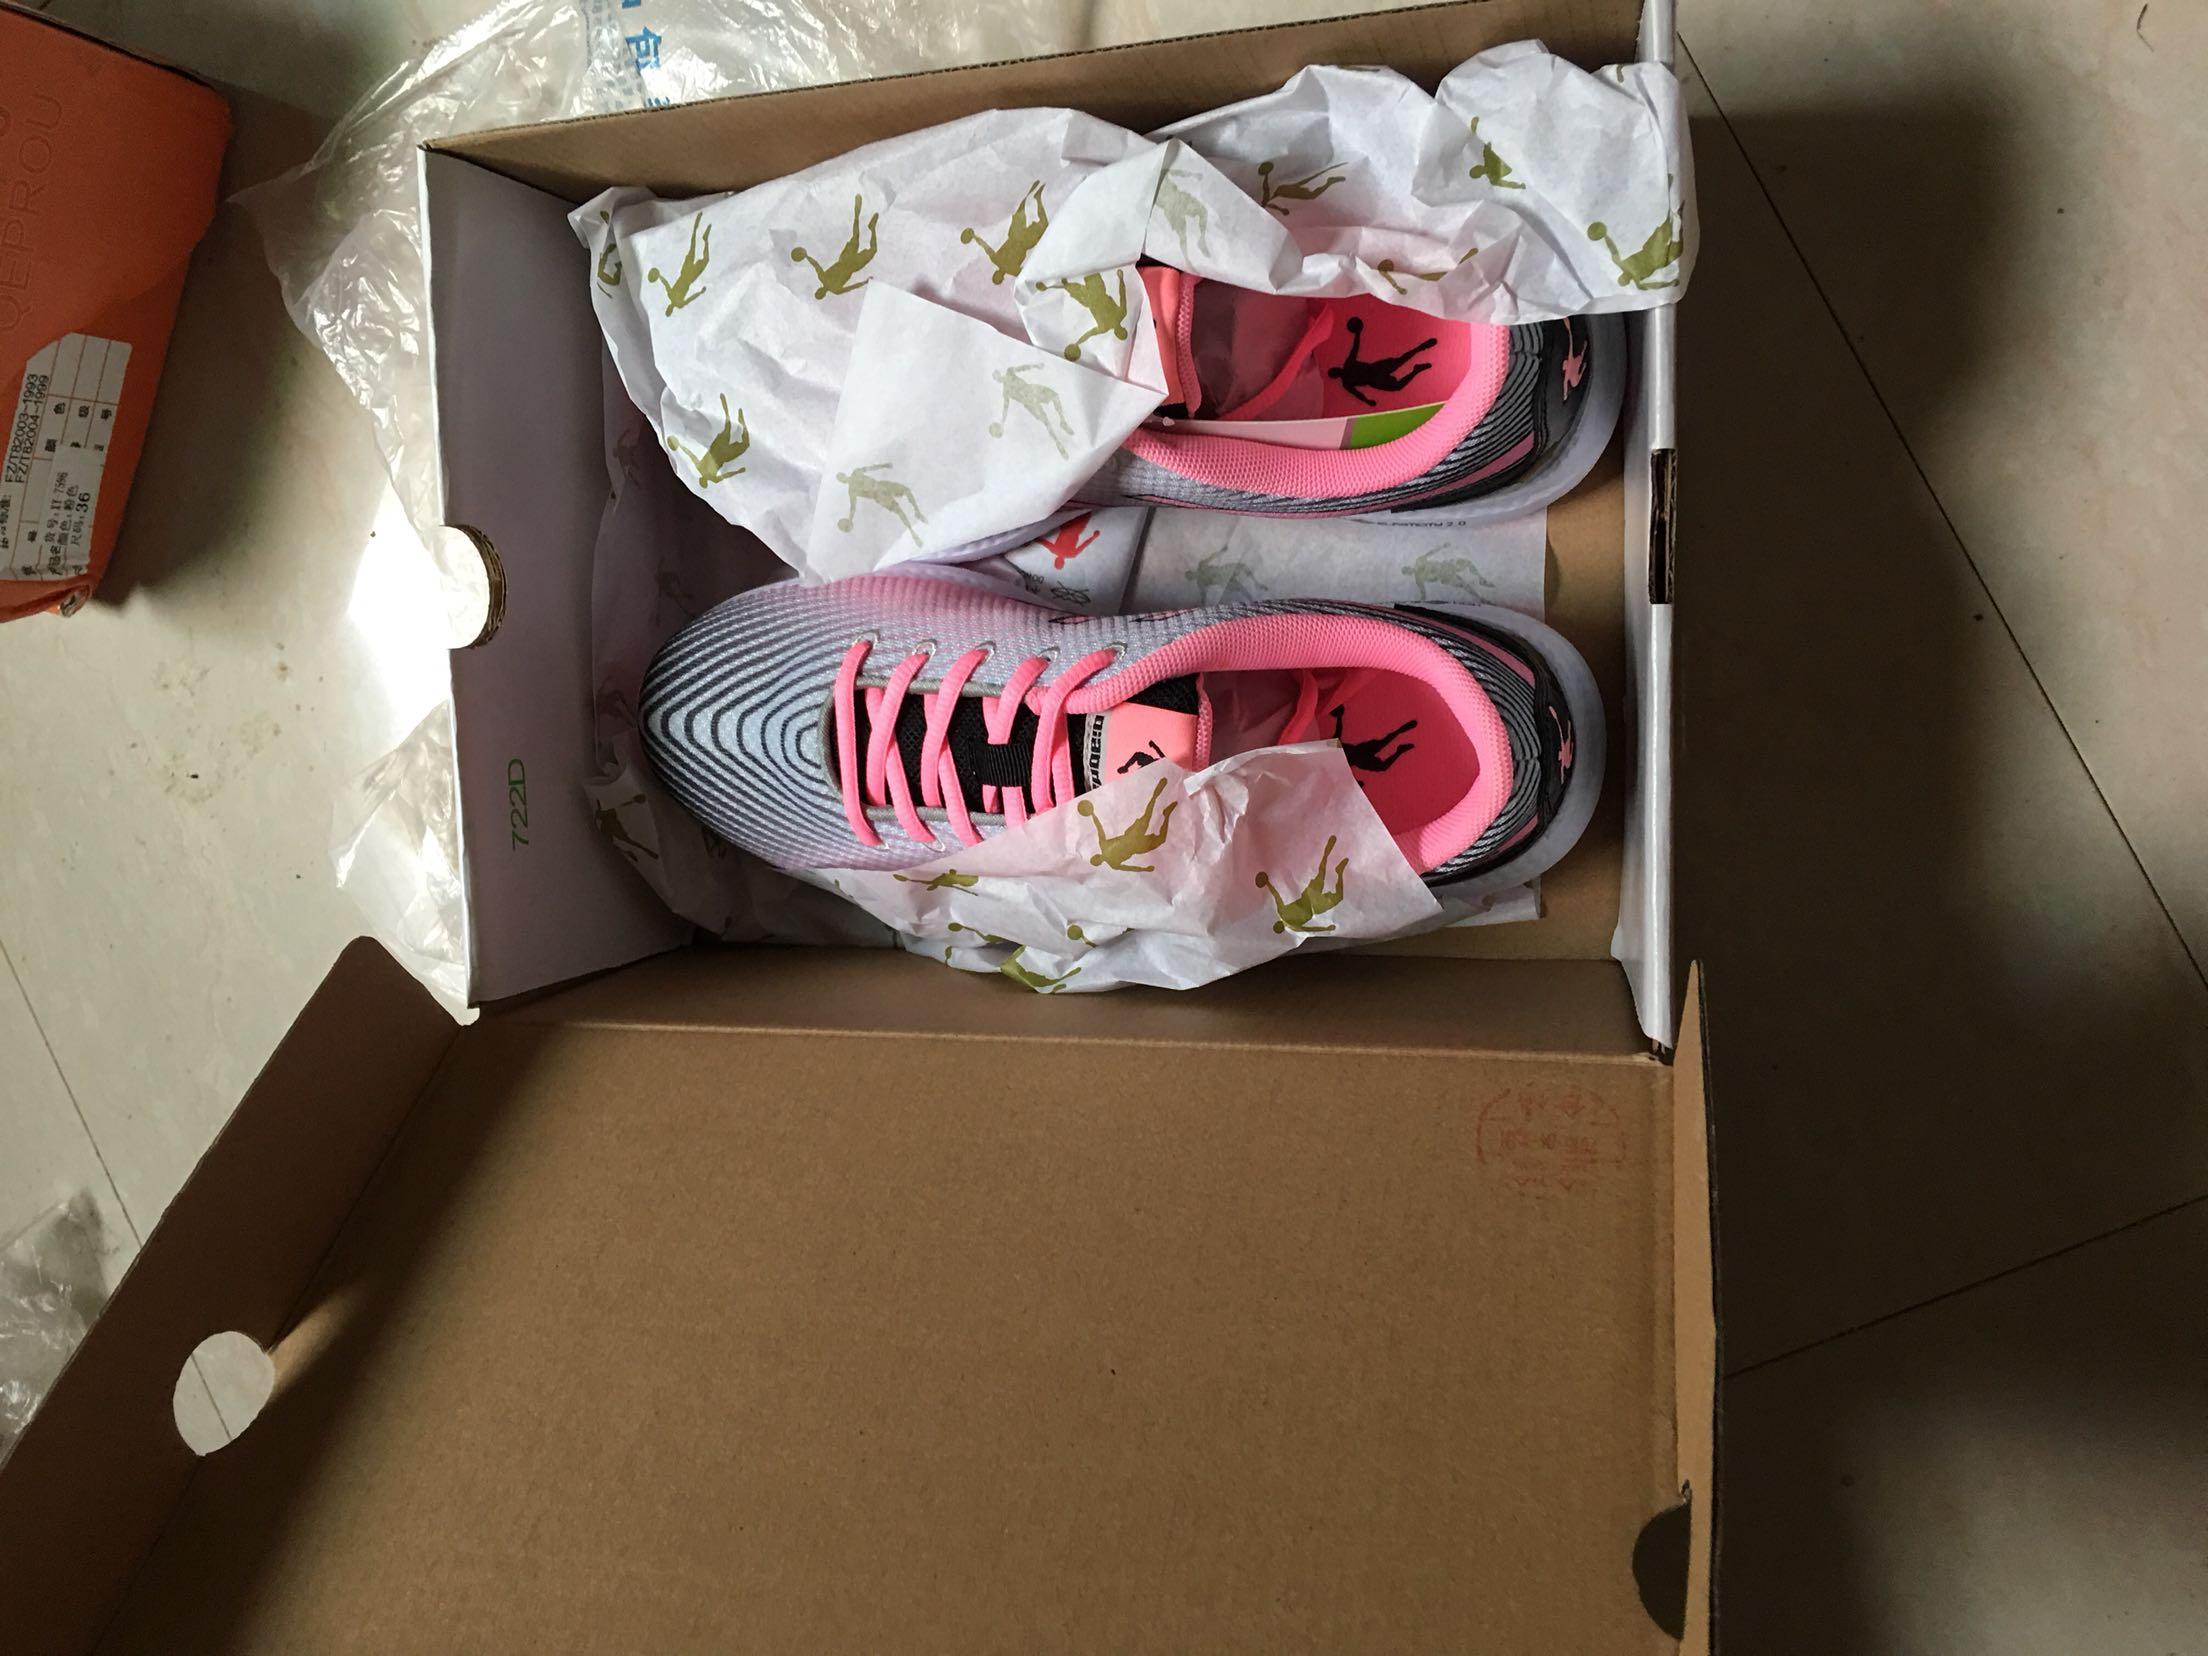 8d9ecefd47 跟妈妈买的亲子鞋,渐变色,我喜欢。   jordan 13 shoes 2013